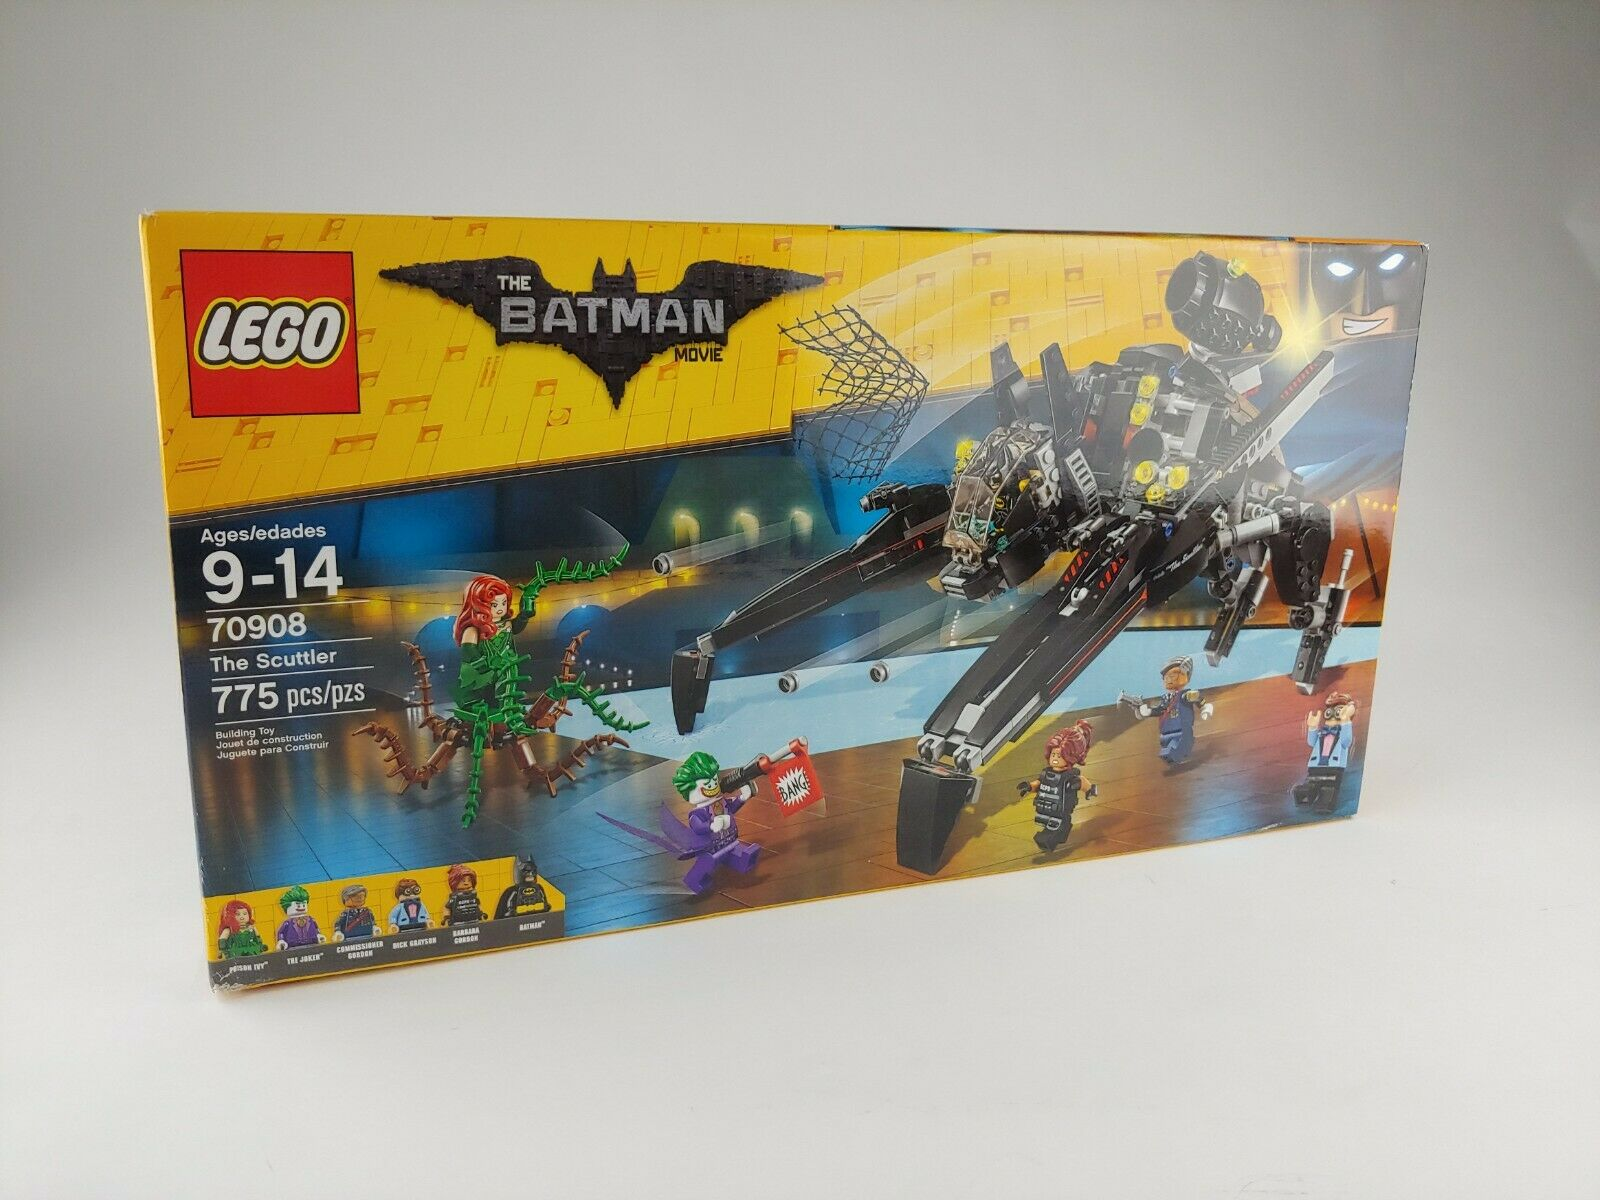 Lego The Batman Movie 70908 The Scuttler Batman Minifigure Free Shipping No Box